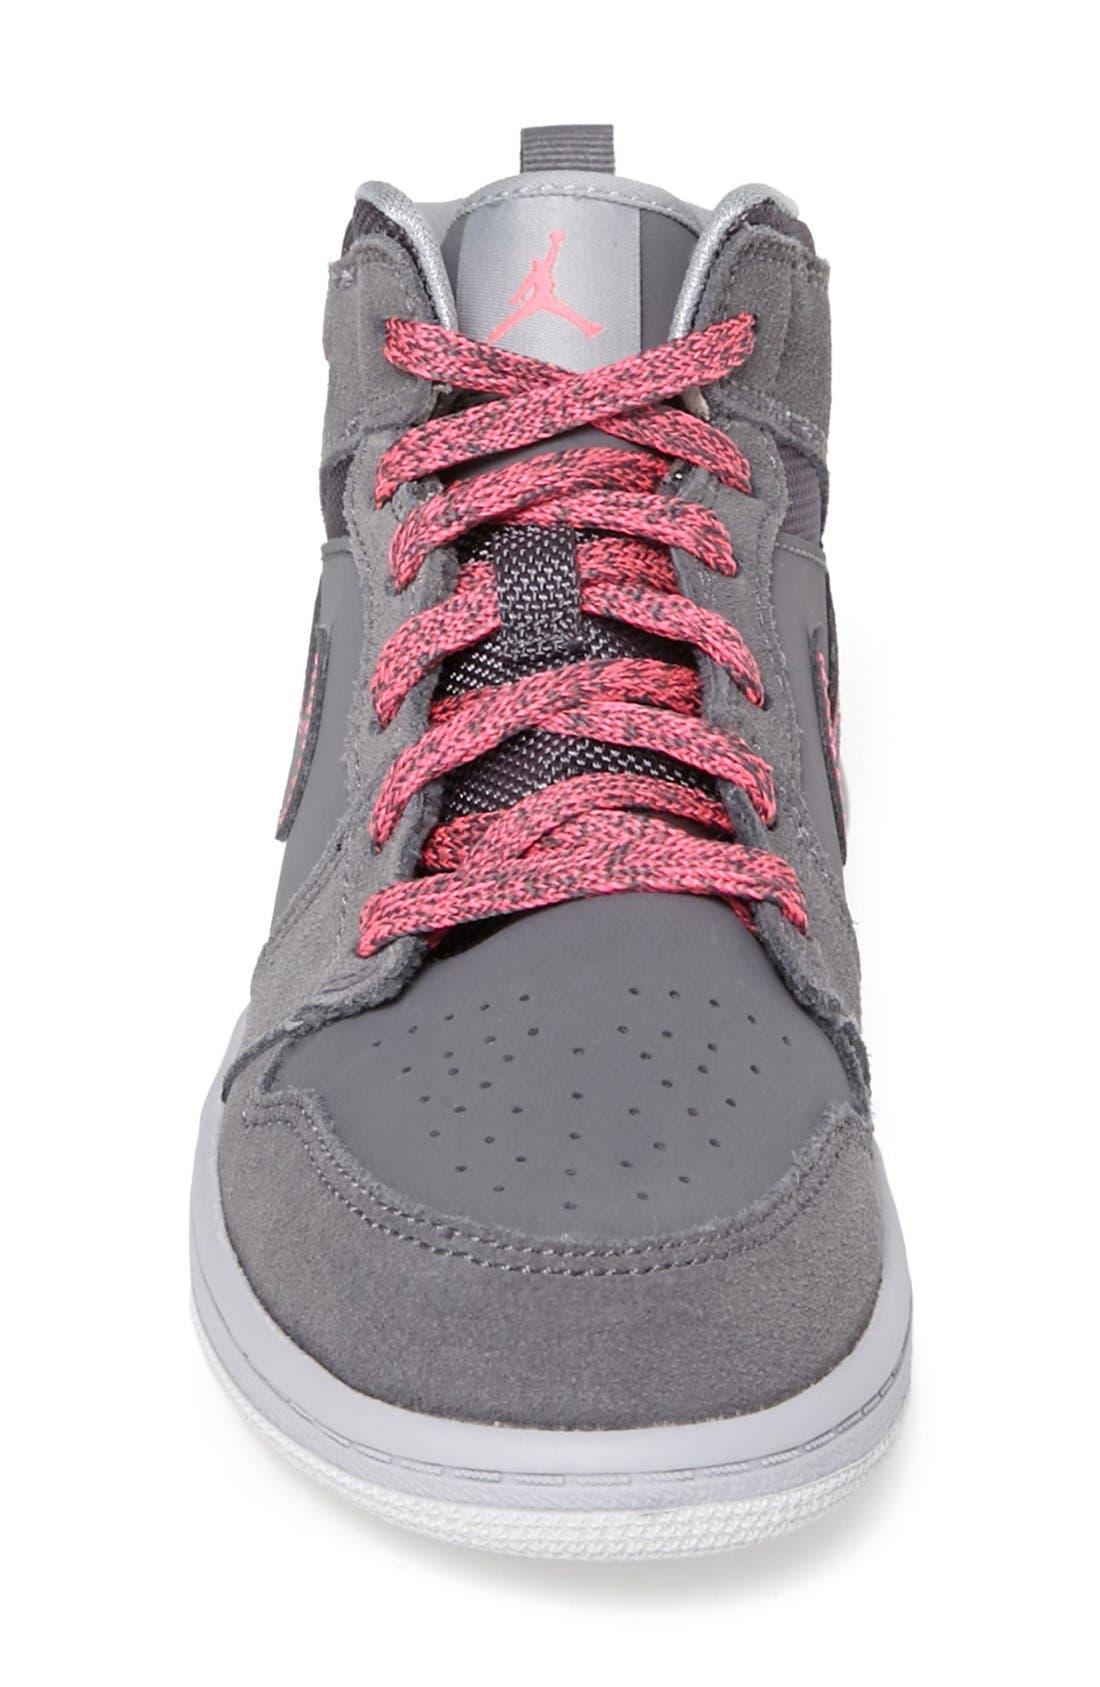 Alternate Image 3  - Nike 'Air Jordan 1 Mid' Sneaker (Toddler & Little Kid)